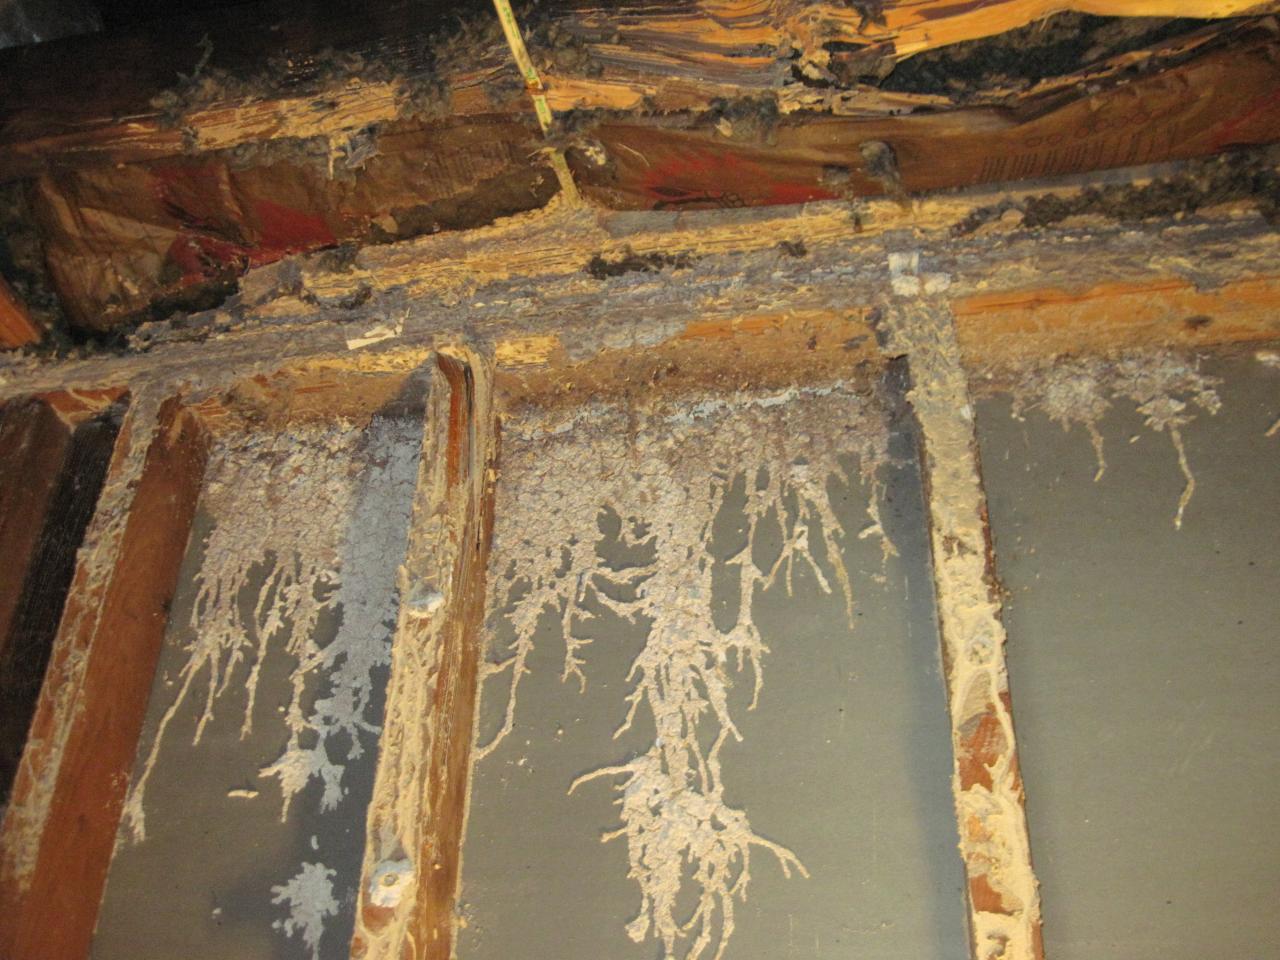 Termite_Damage.68104646_large.jpg